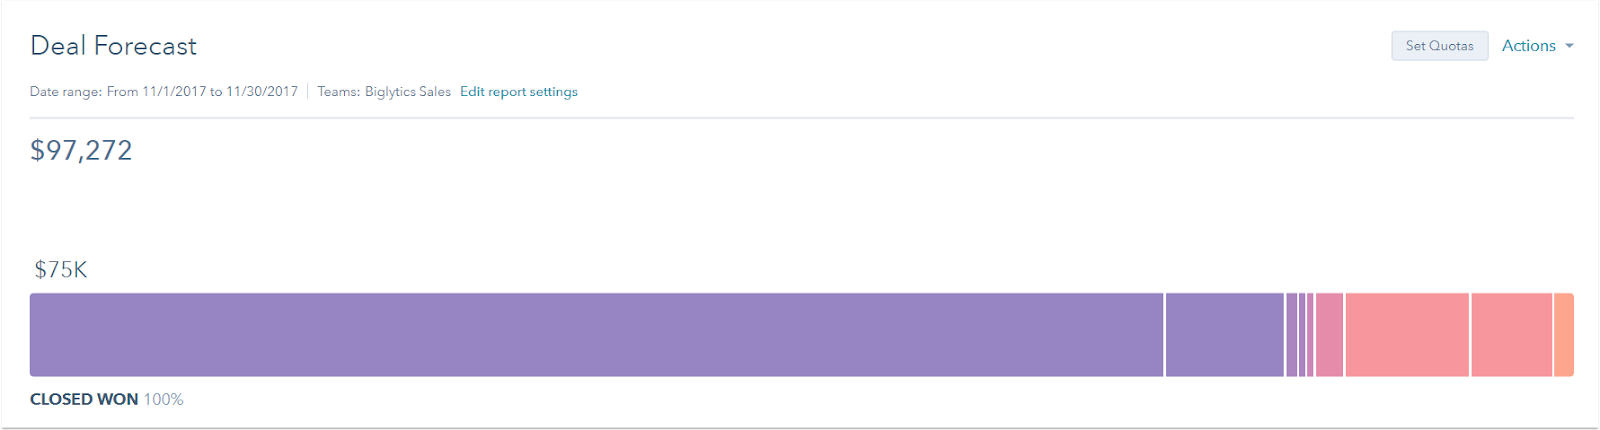 HubSpot Sales Dashboard example